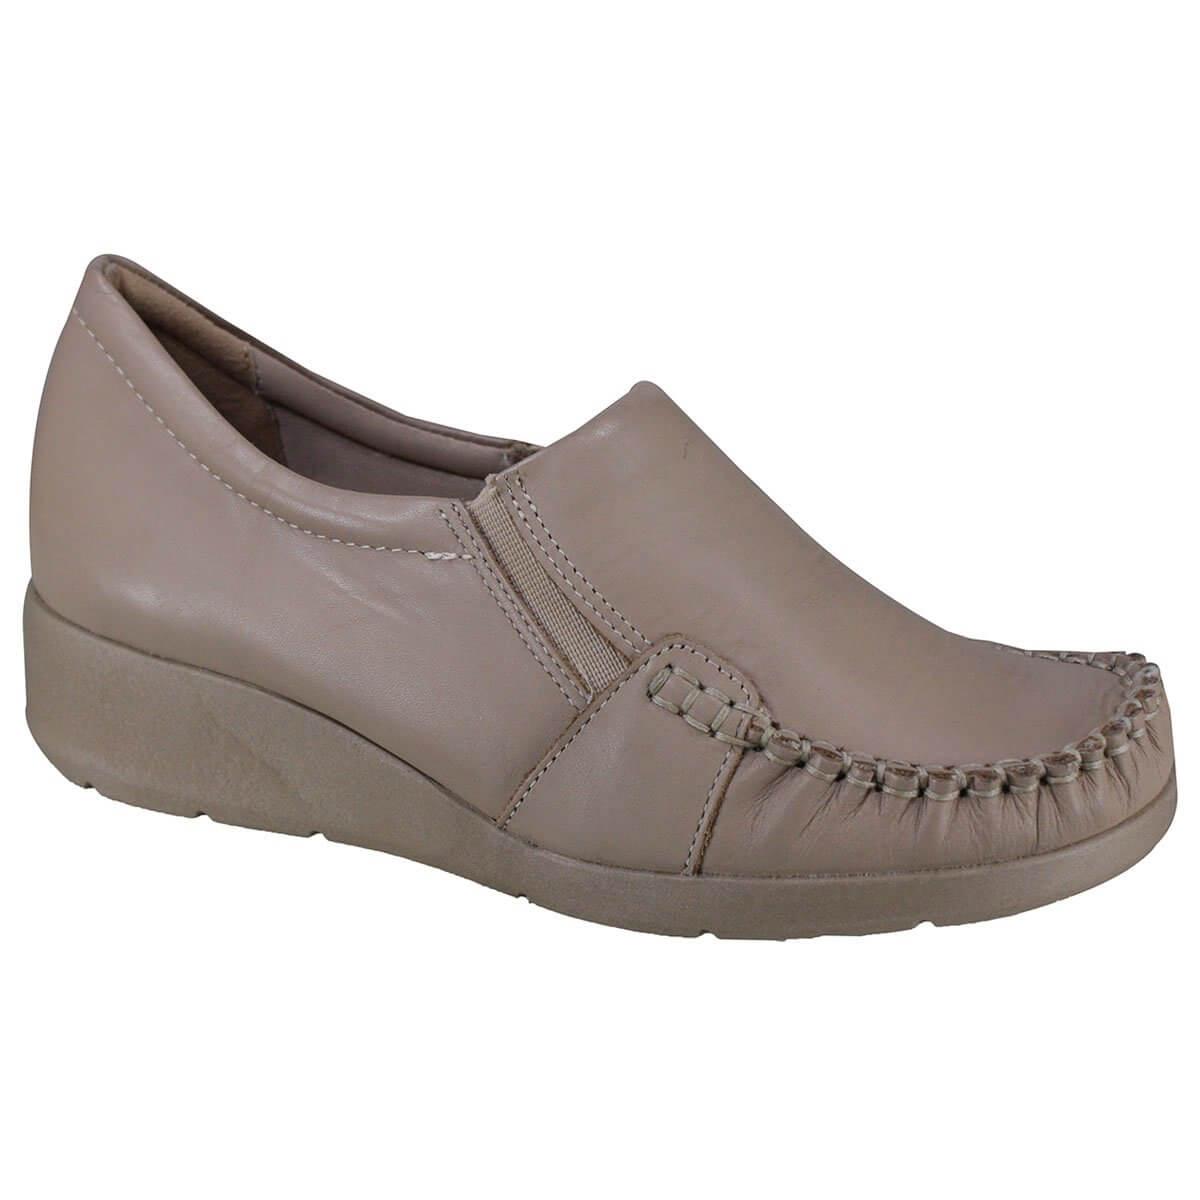 80e44d632 Sapato Feminino Comfortflex 18-93304 000010 - Avelã (Napa Vestuario ...